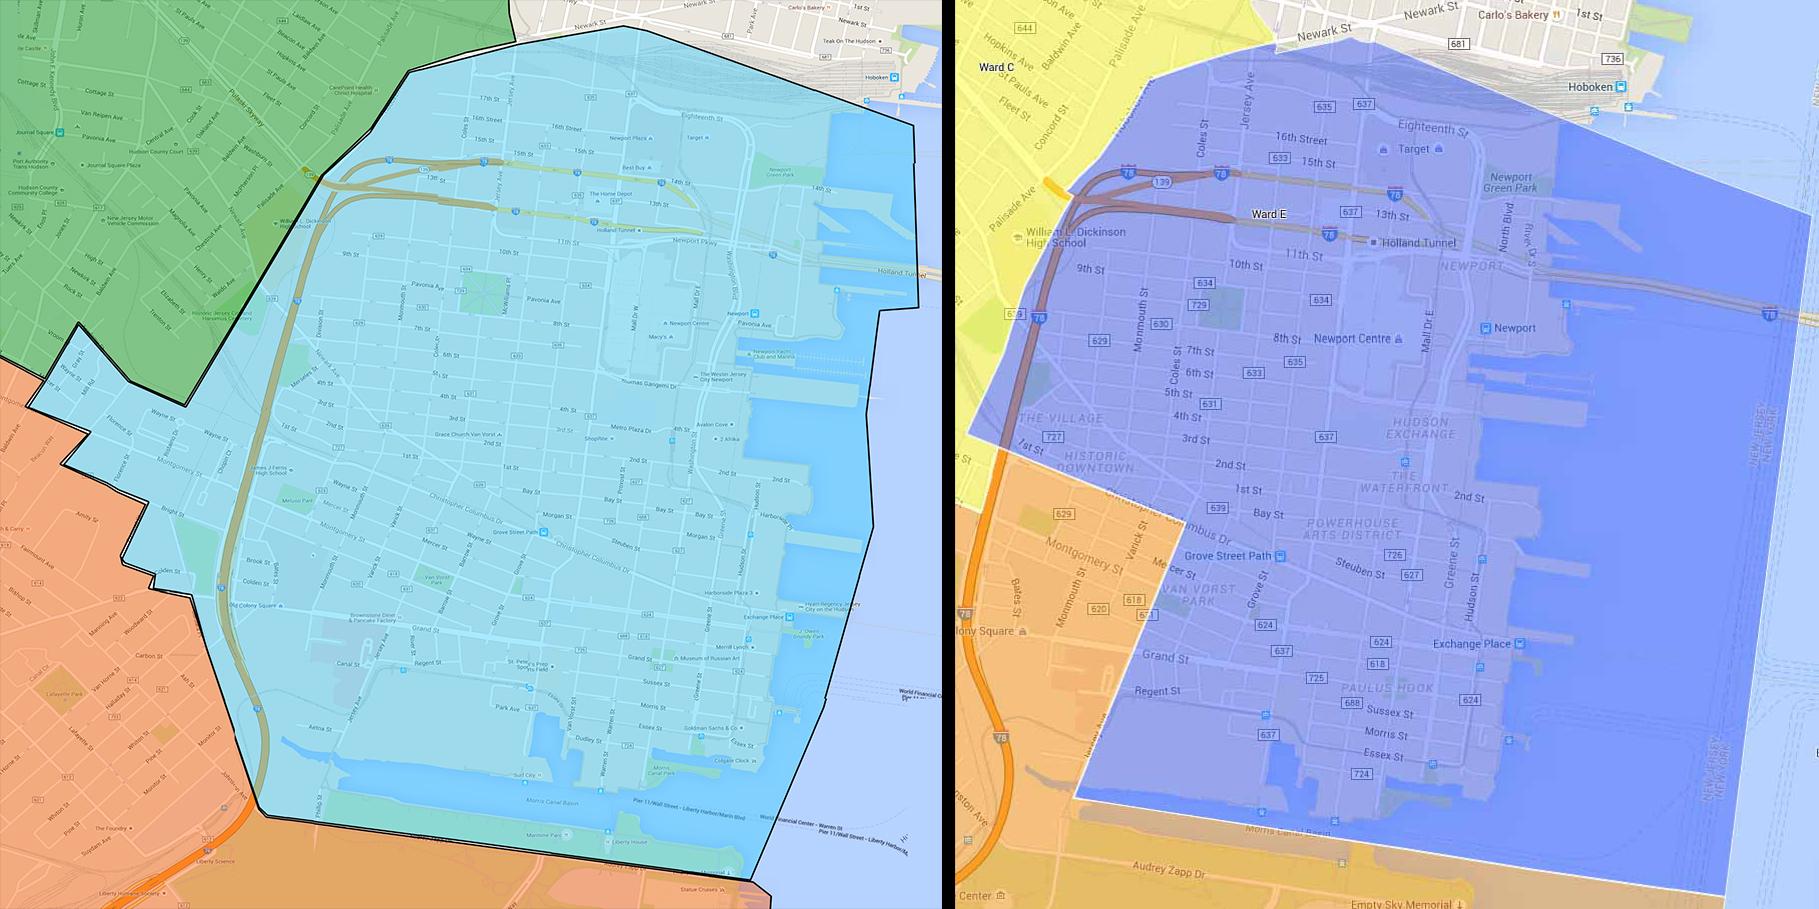 Ward E - Downtown Jersey City - 2009 (L), 2012 (R)